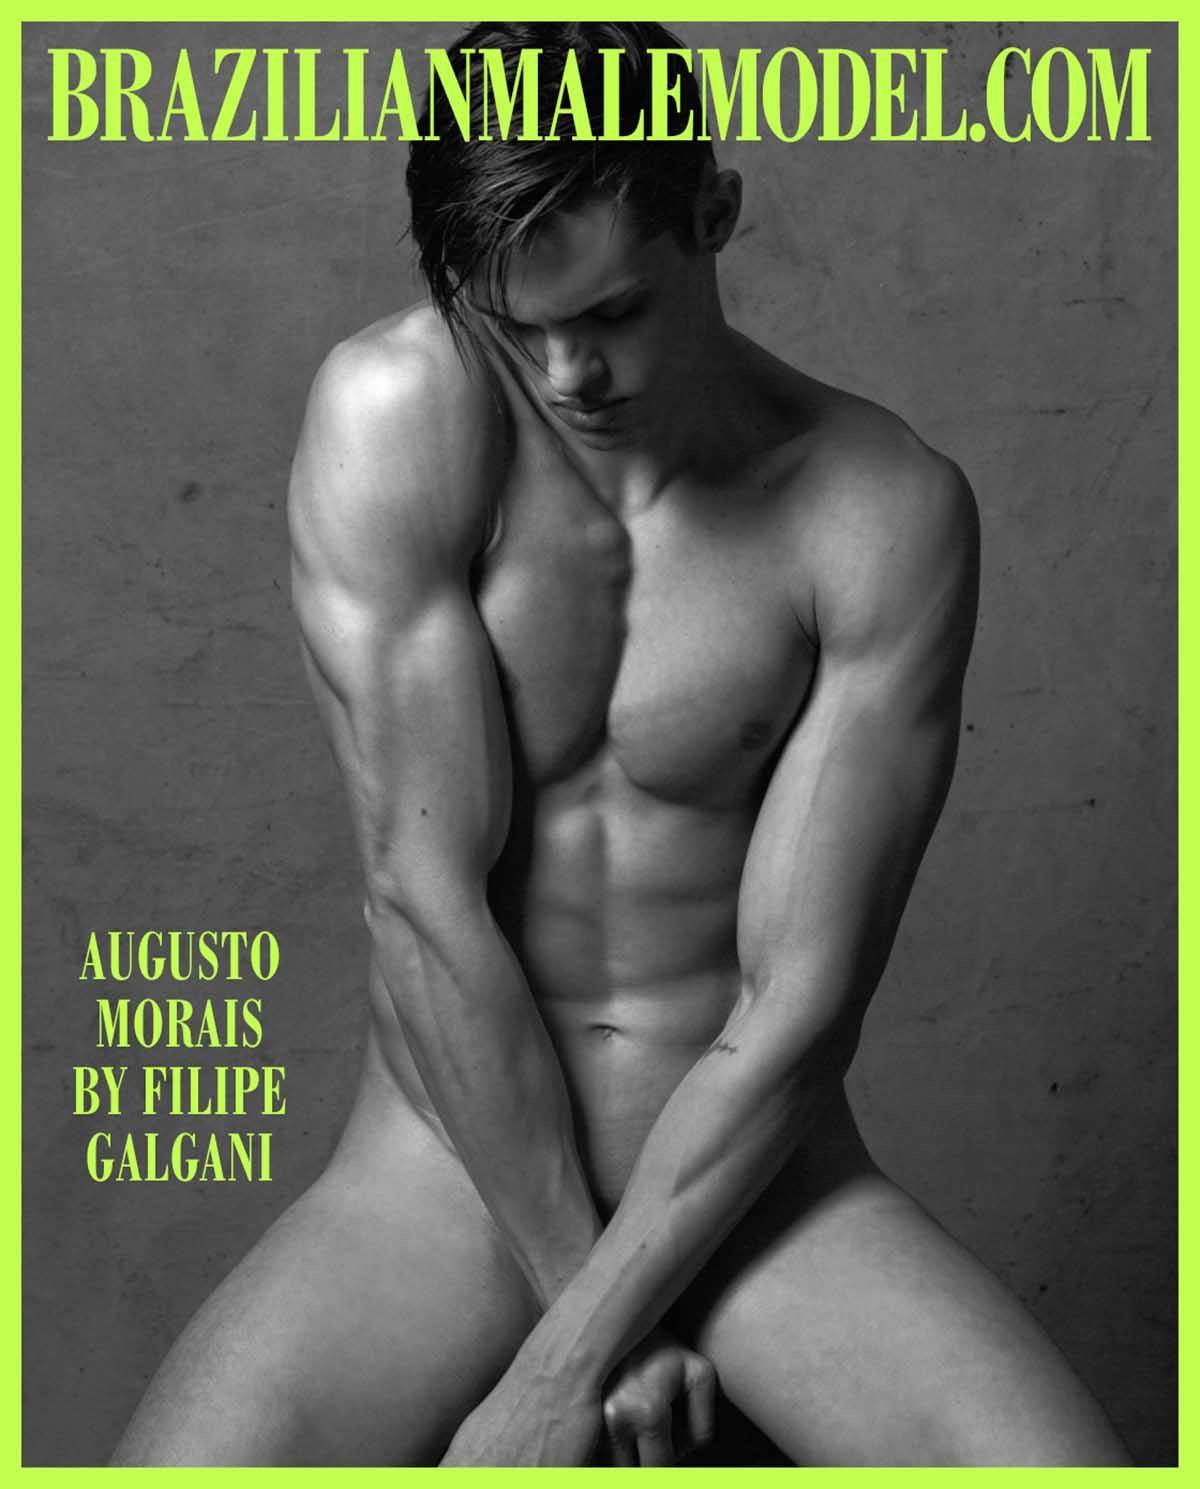 Augusto Moraes X Filipe Galgani X Brazilian Male Model